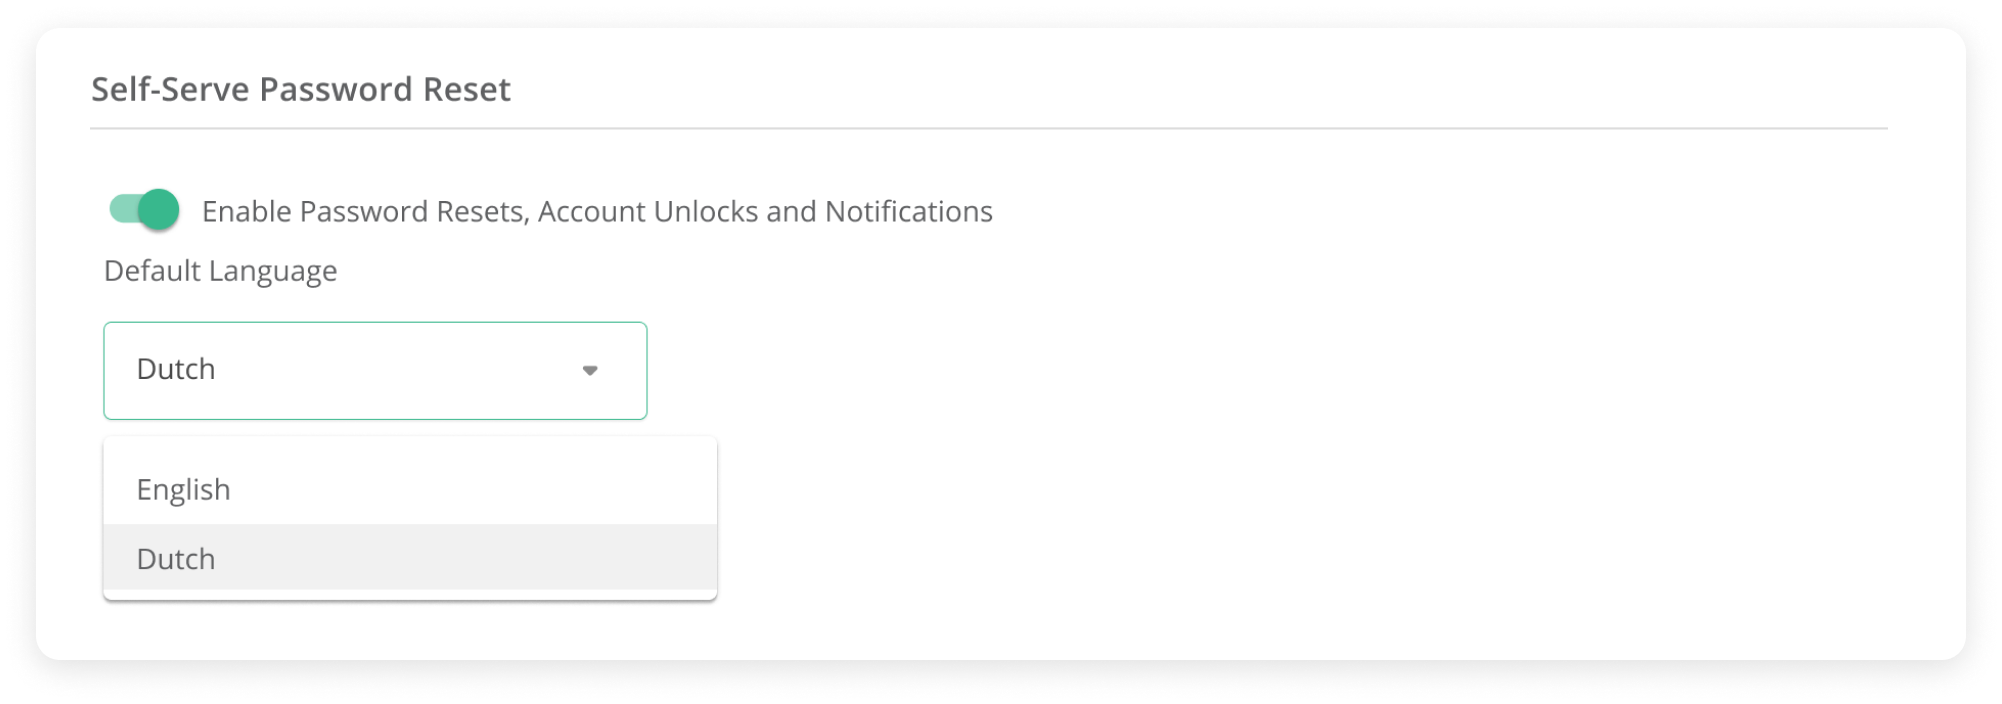 Self-serve password Reset options